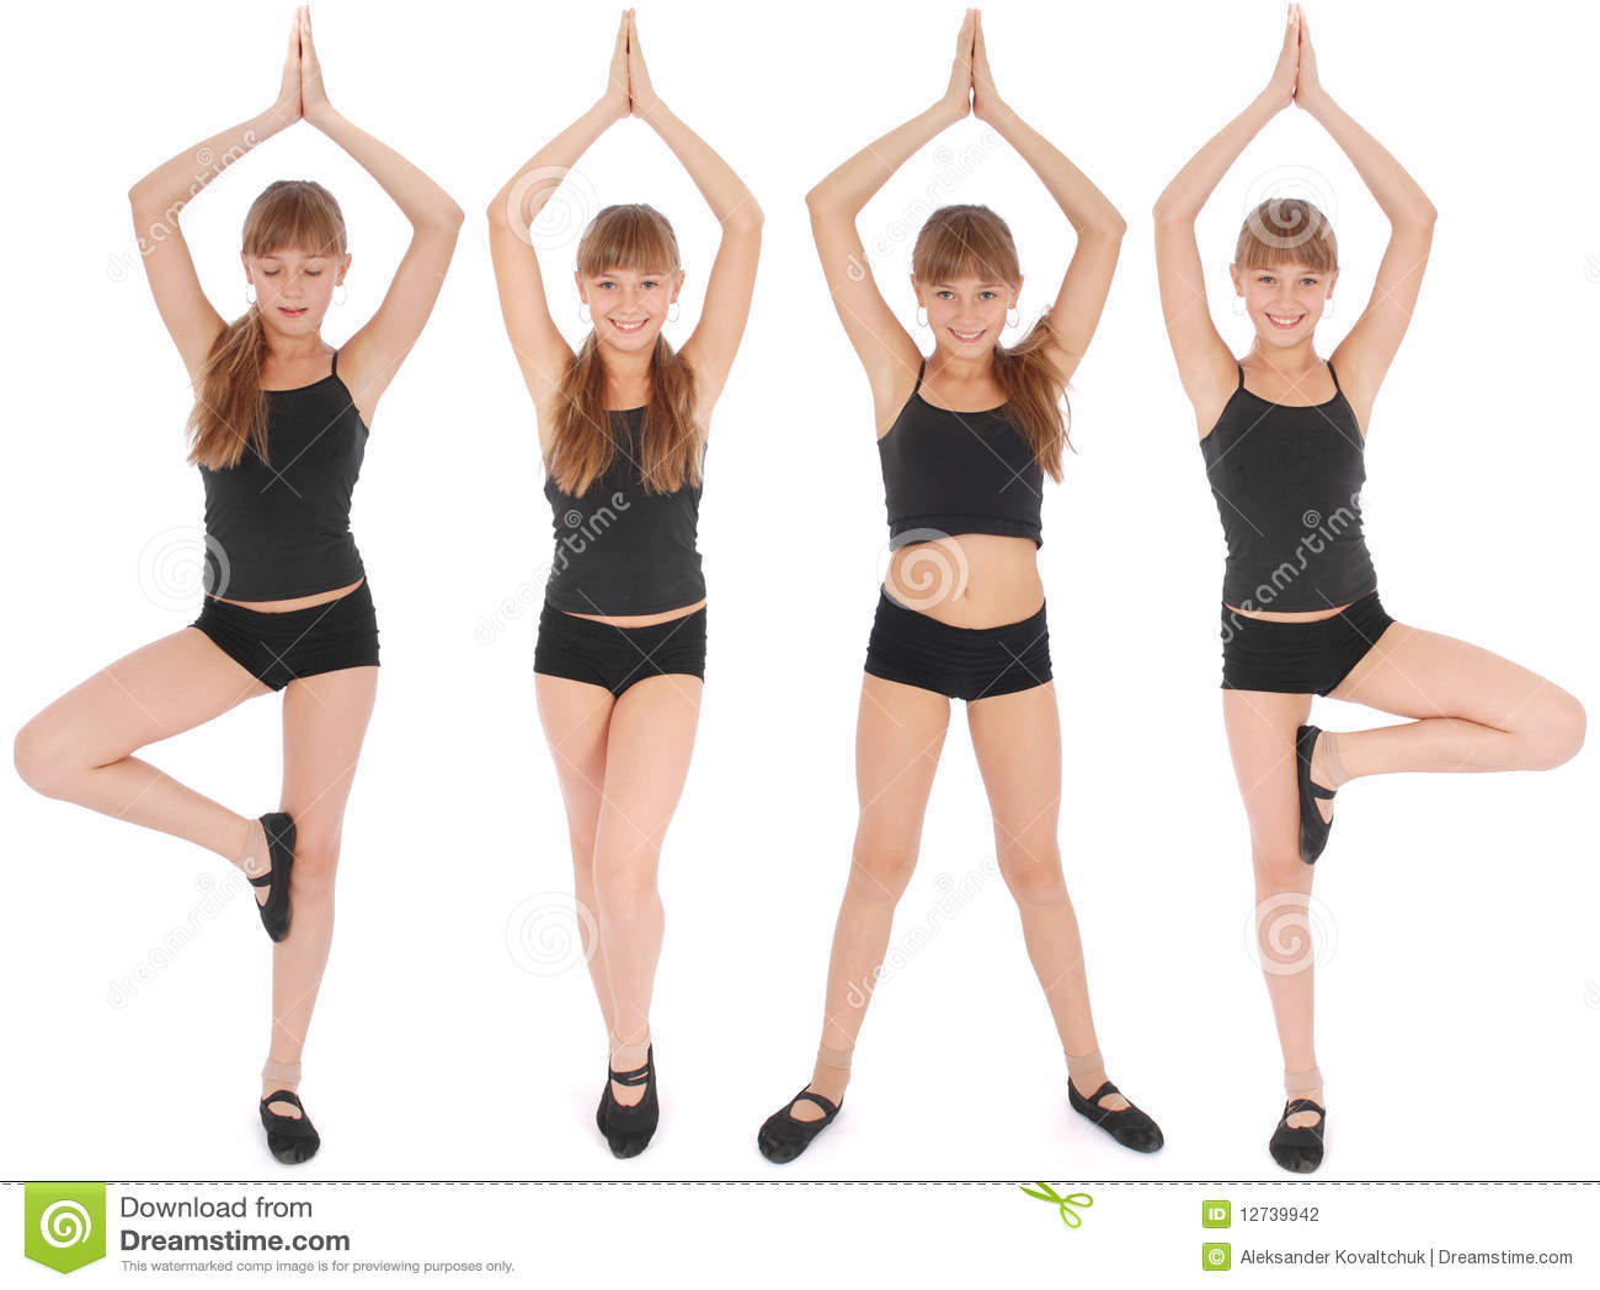 Four Poses. Young Girl Making Yoga Exercises Stock Photo - Image